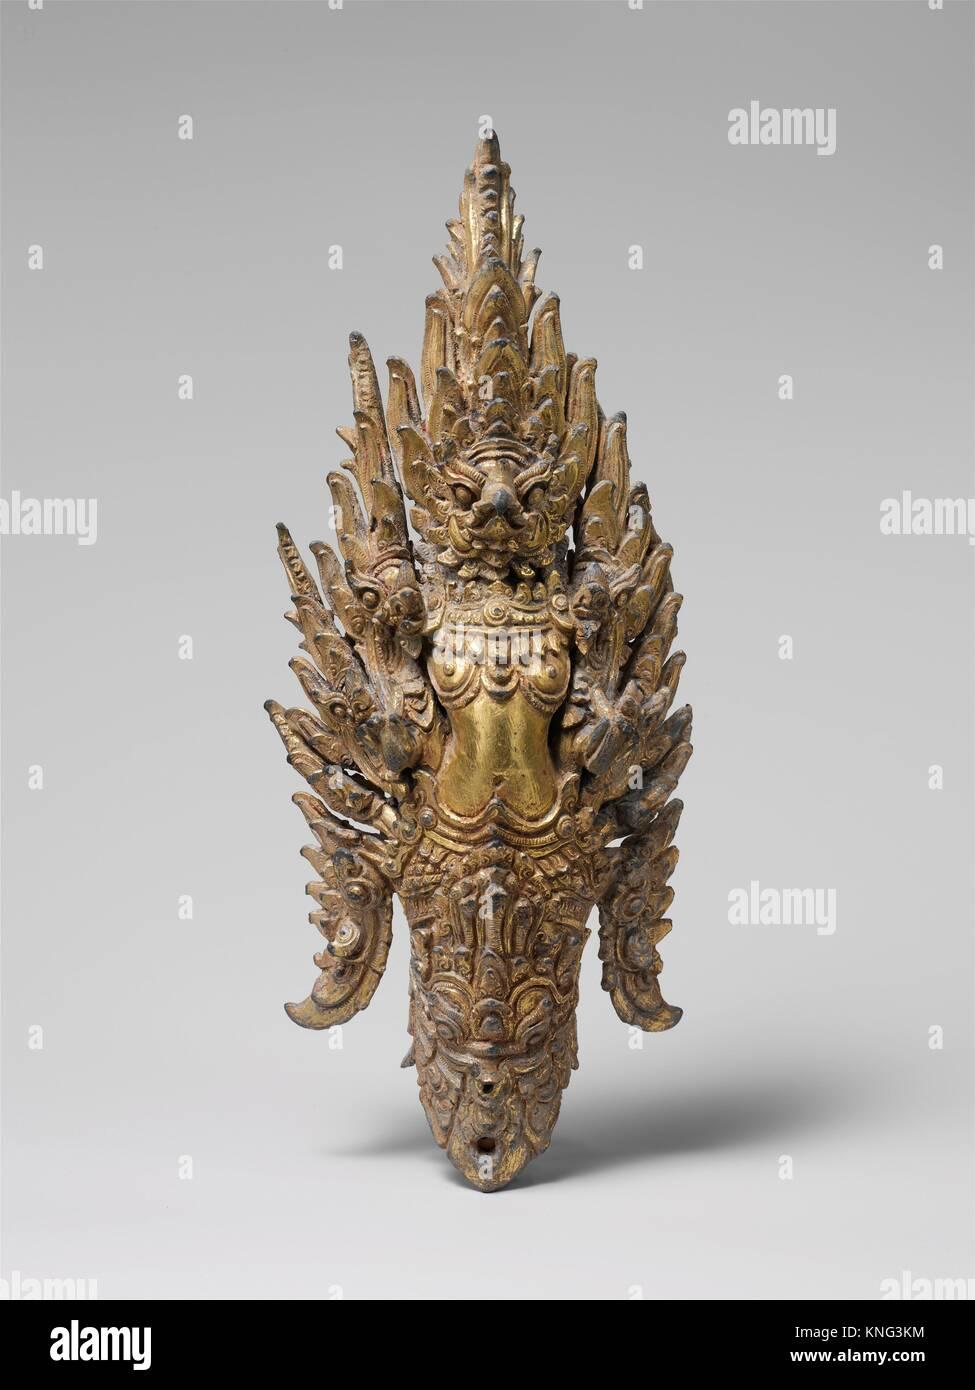 Garuda Finial. Date: late 12th-early 13th century; Culture: Thailand; Medium: Gilt bronze; Dimensions: H. 9 3/4 - Stock Image